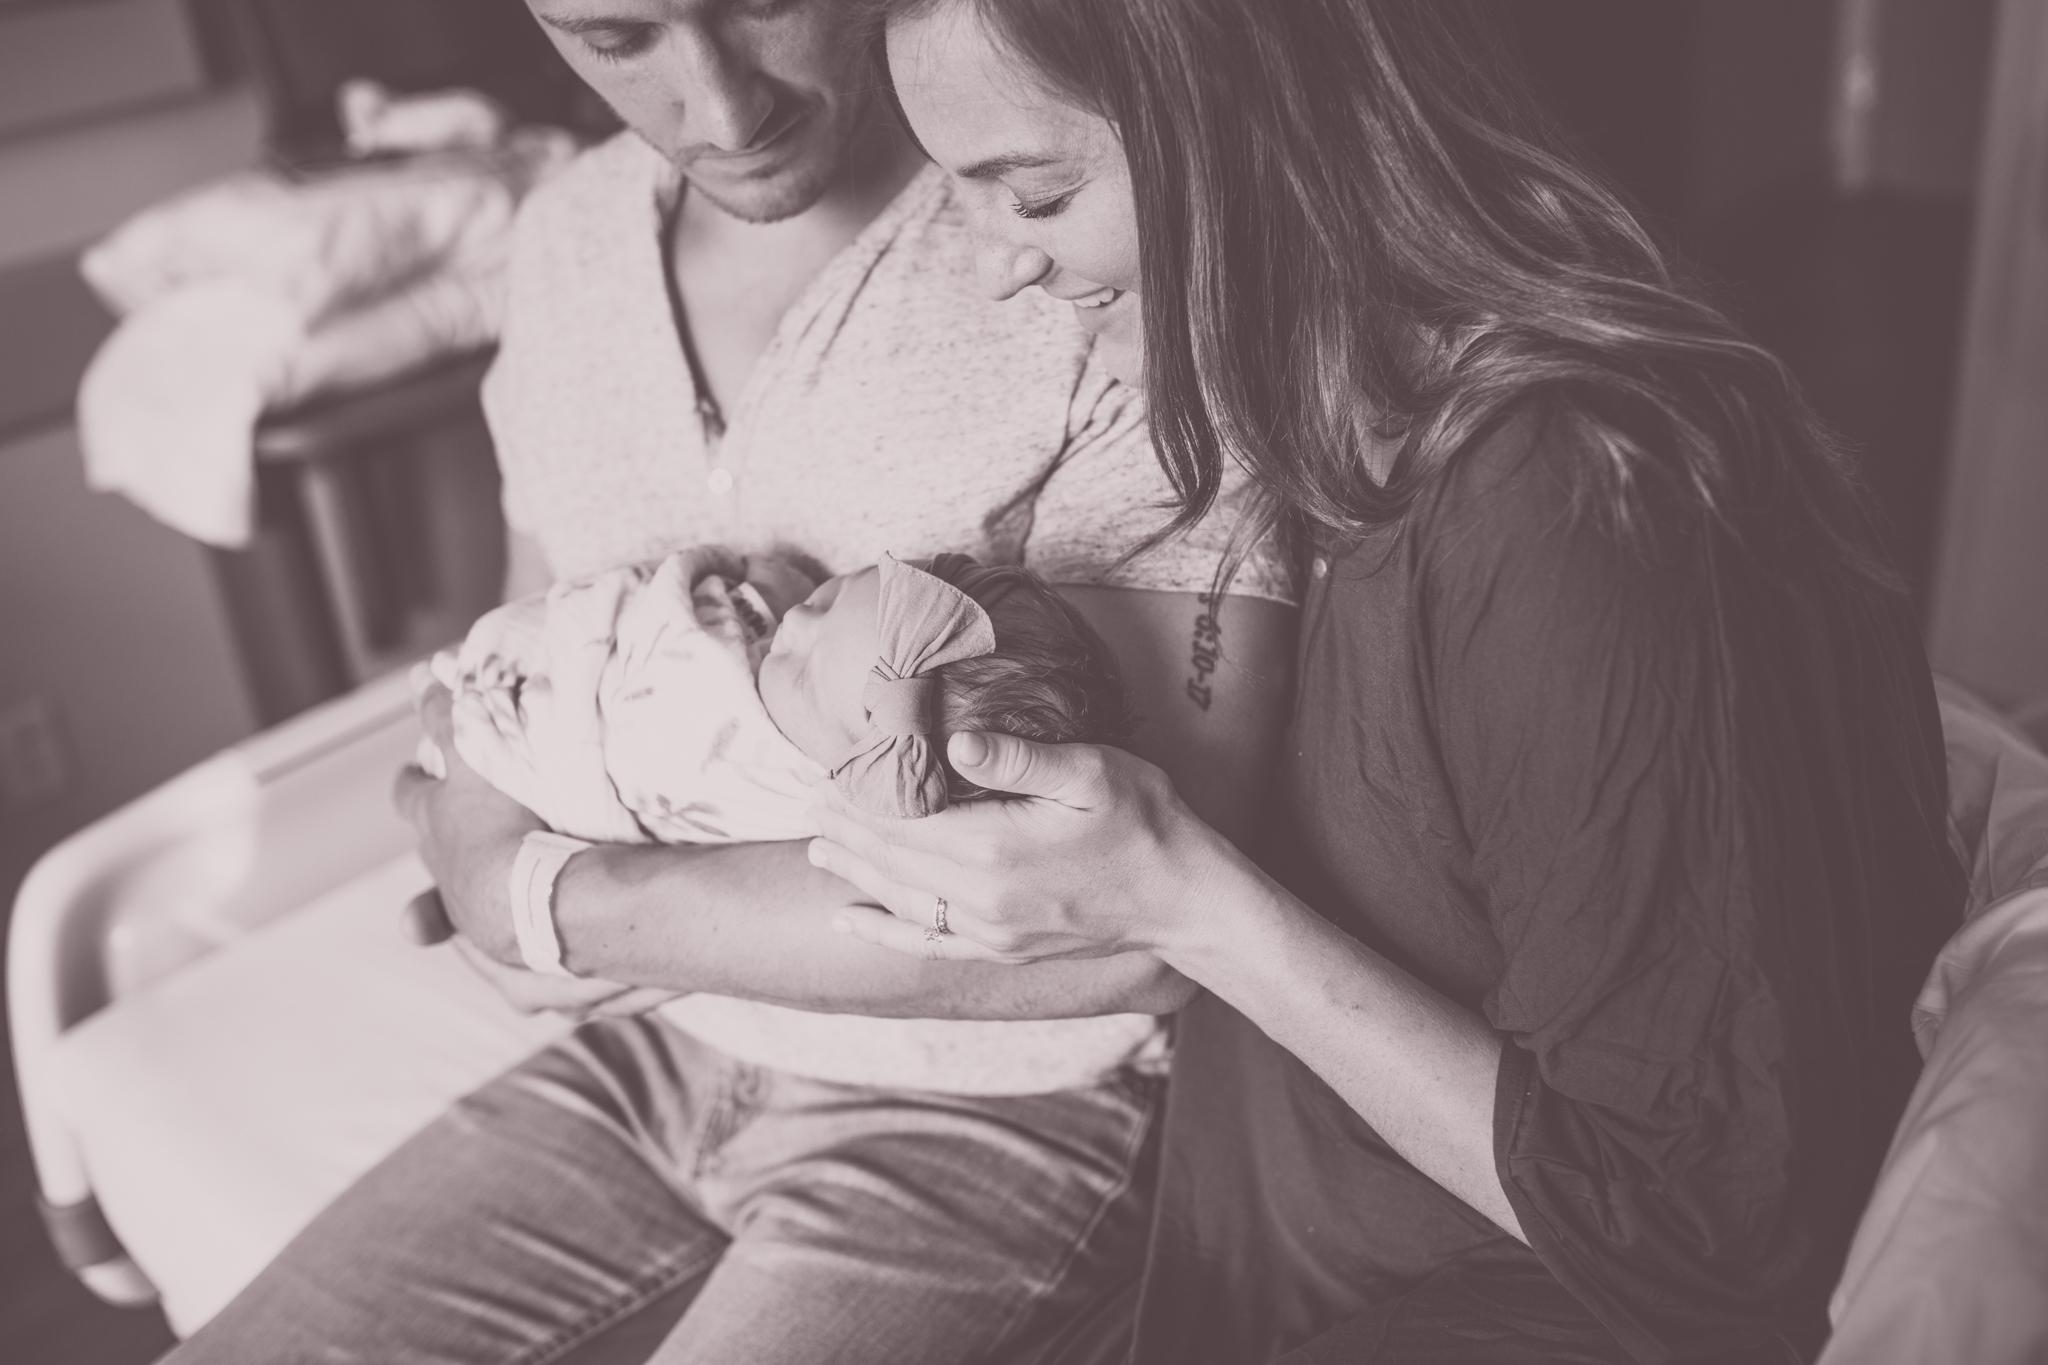 cara peterson photography maternity newborn photos mom dad -16.jpg